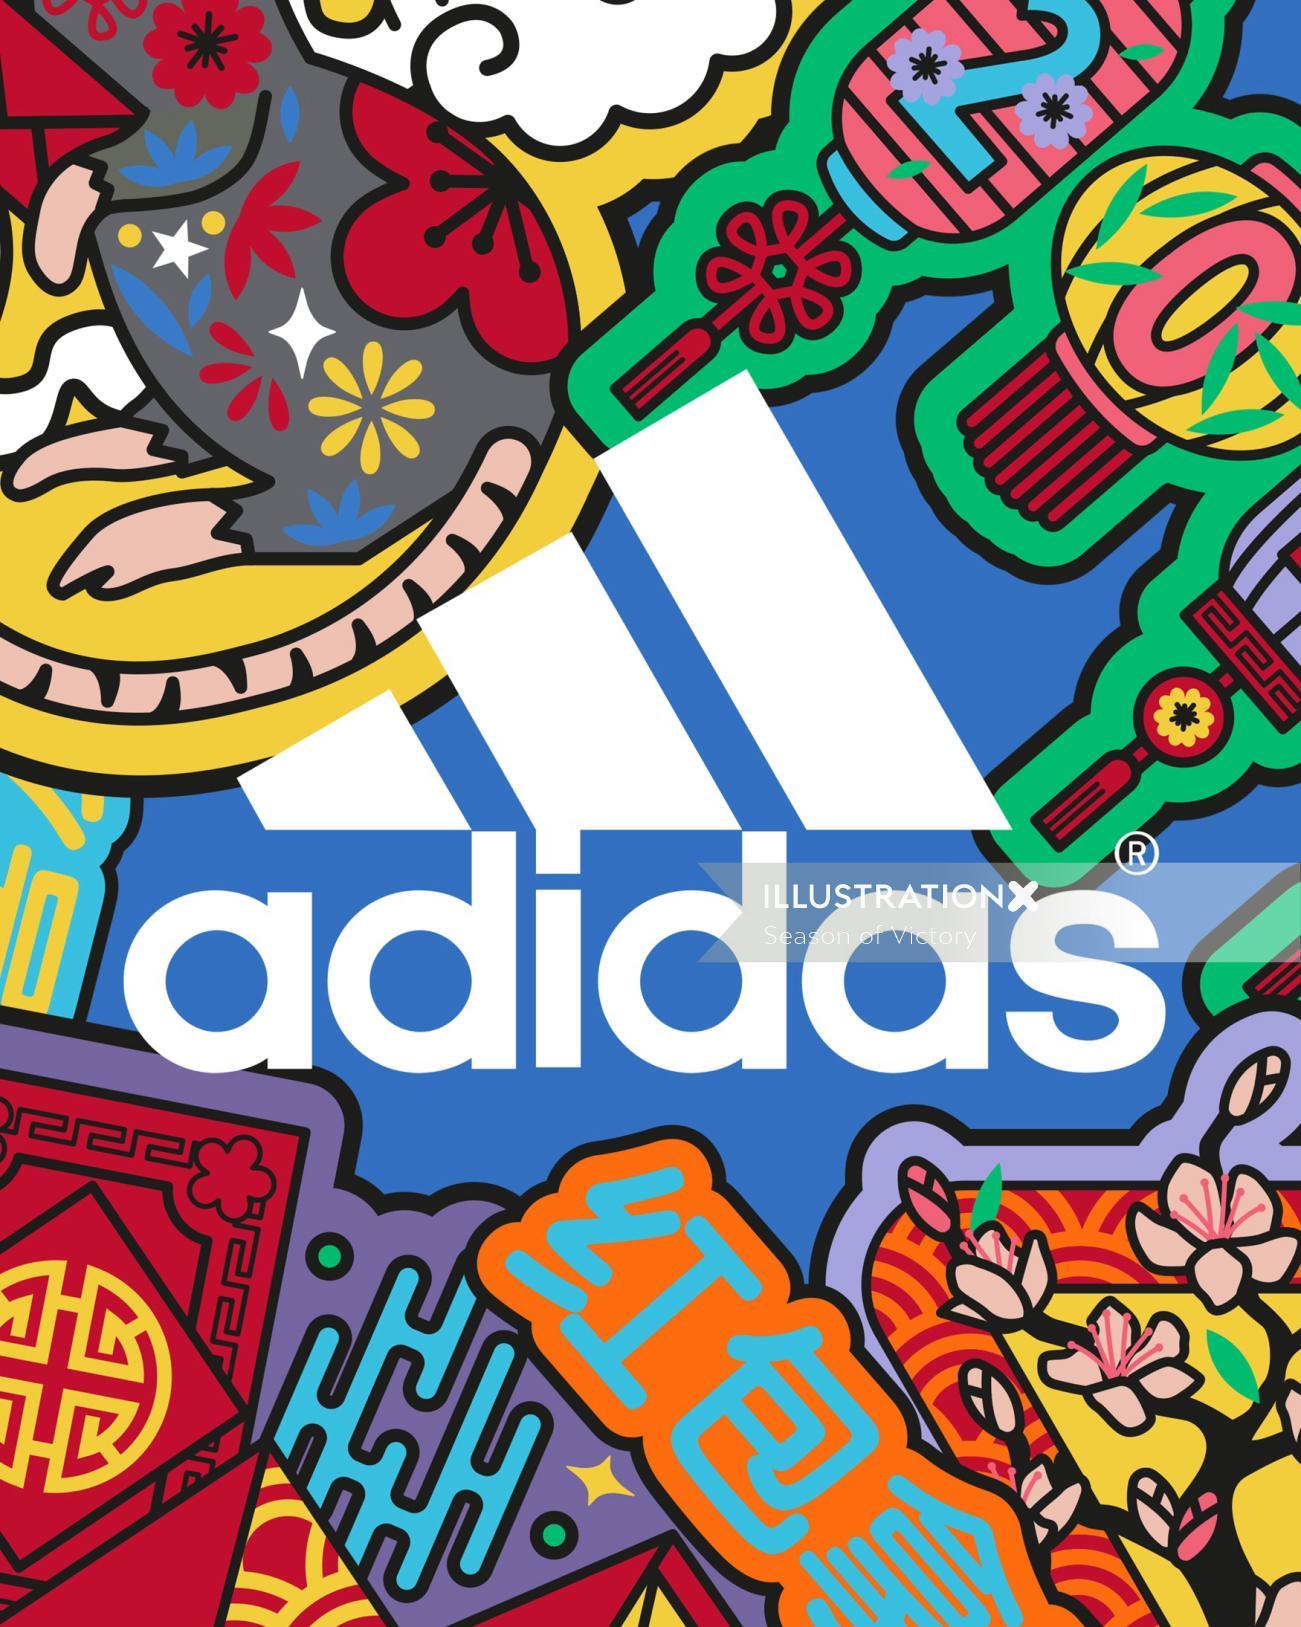 chinesenewyear, cny, cny2020, yearoftherat, adidas, adidasoriginals, adidasldn, badges, icons, anima